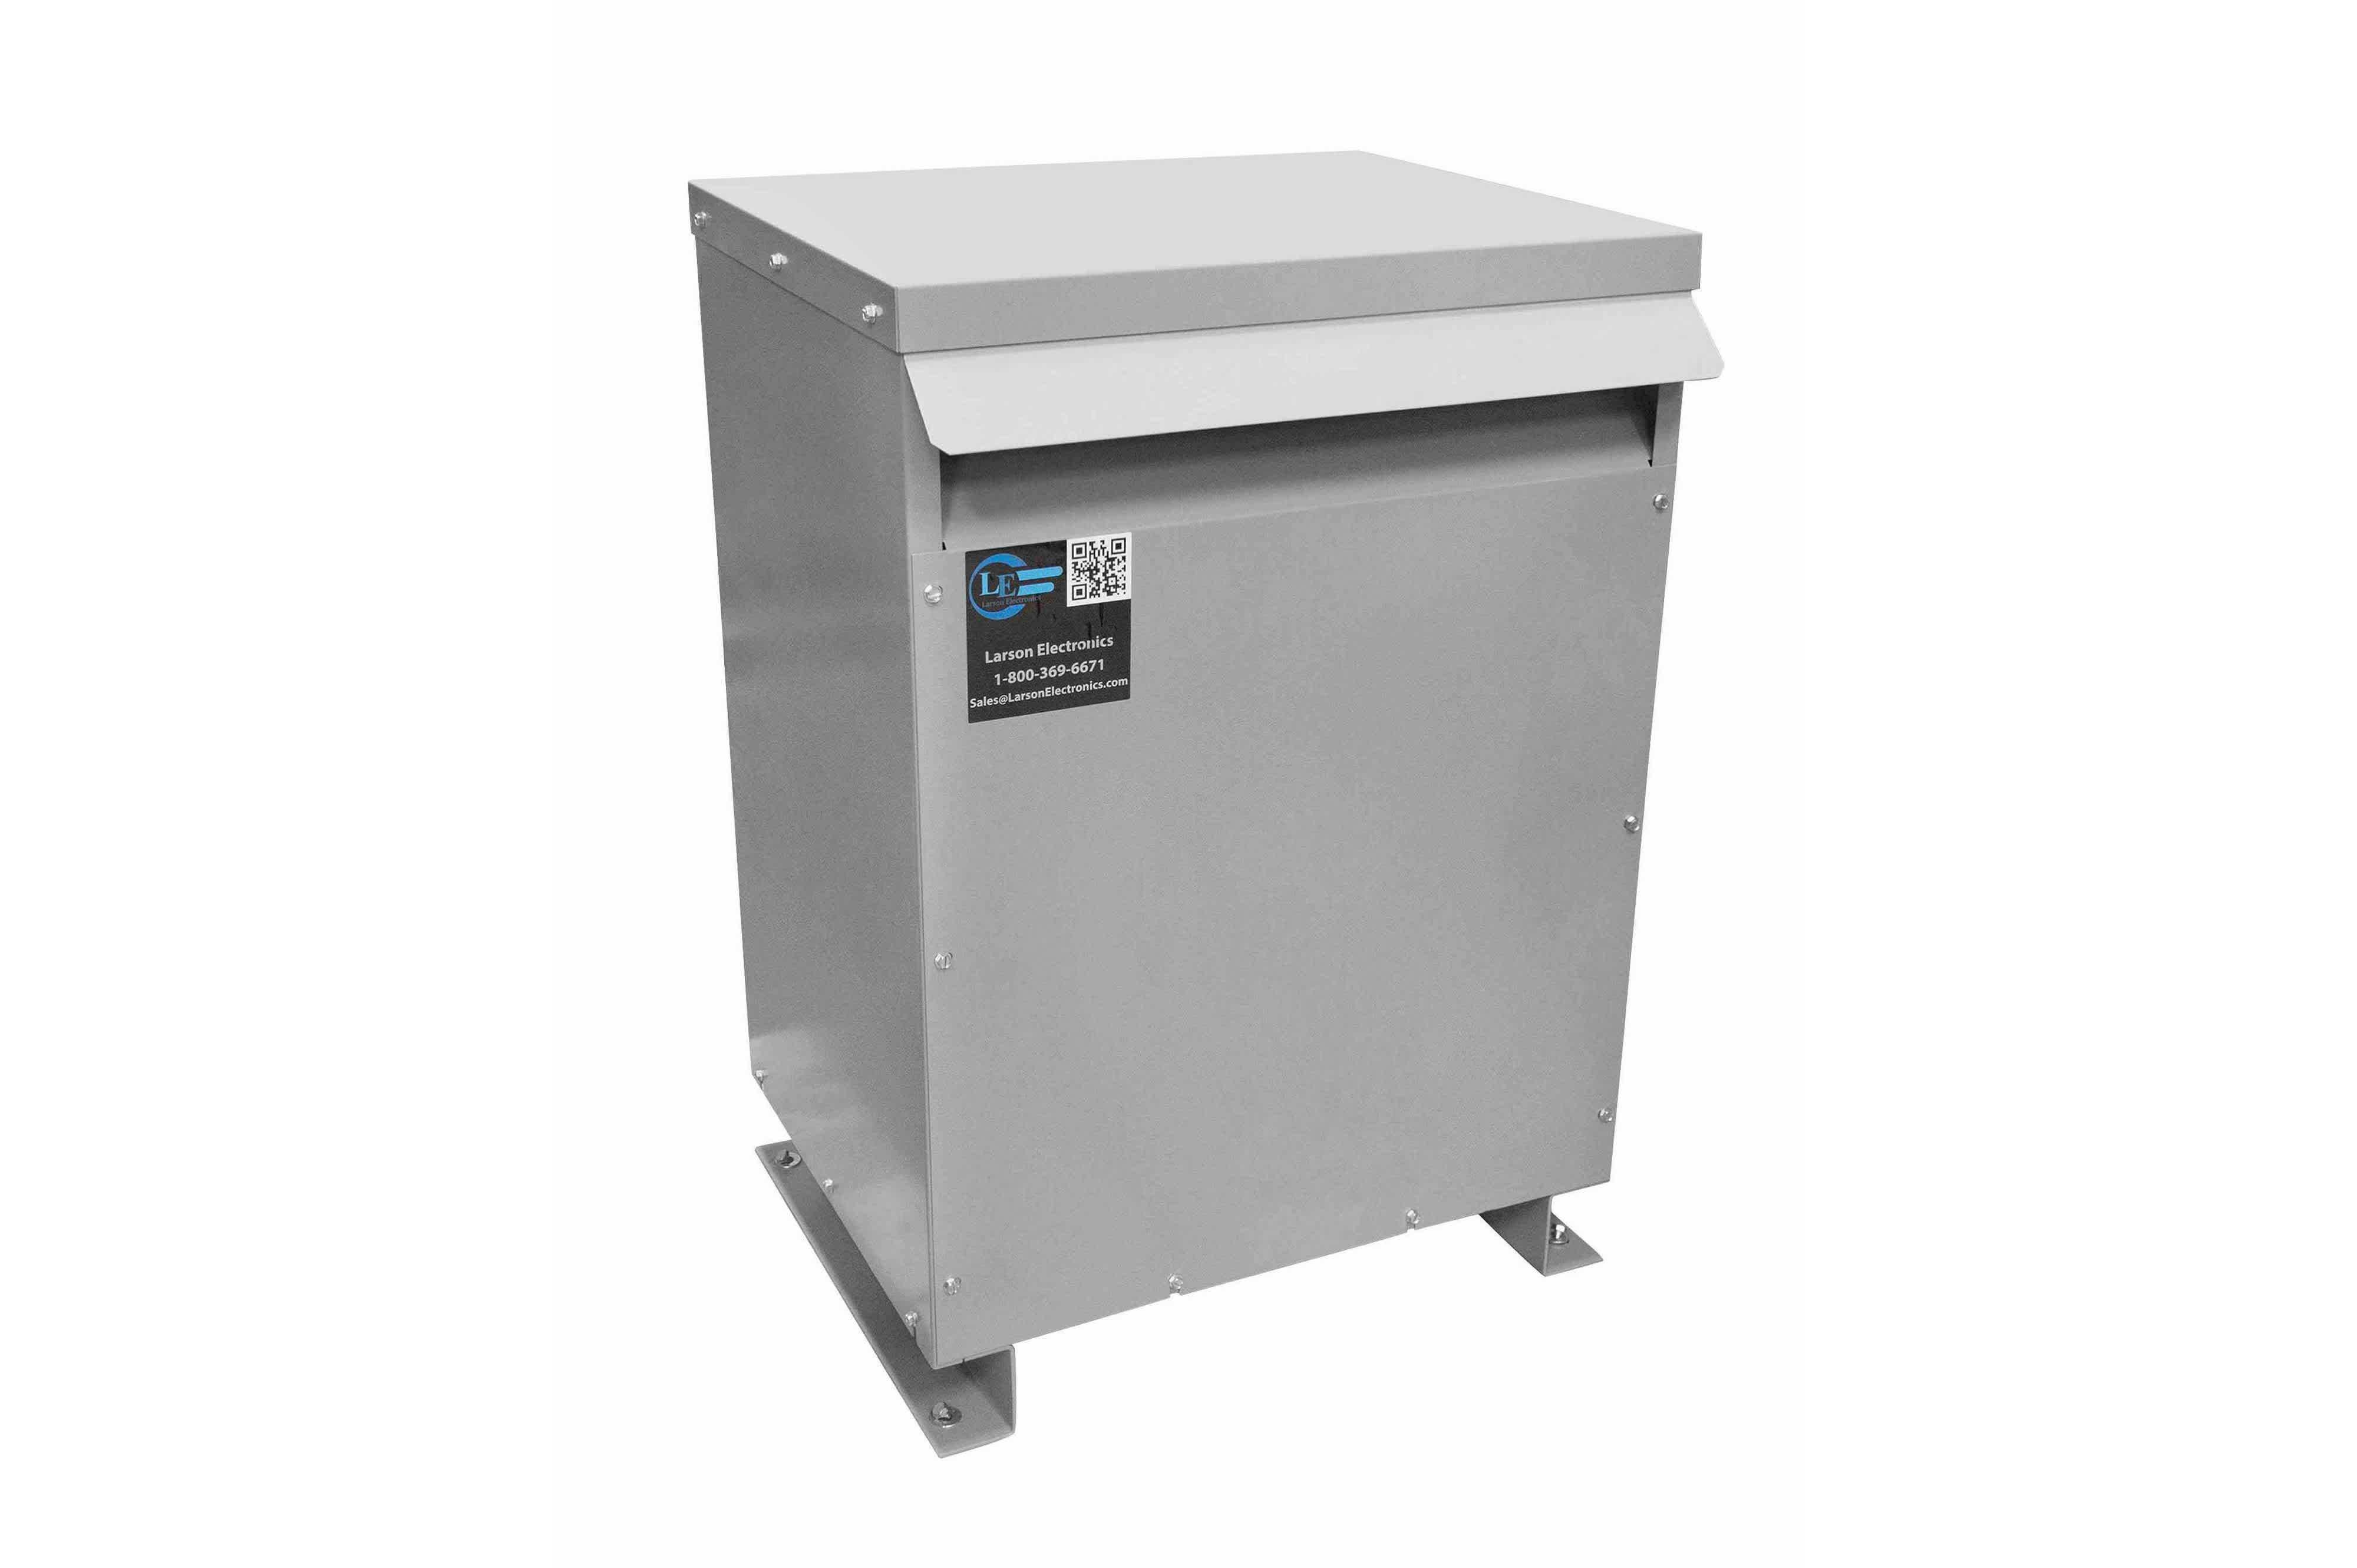 150 kVA 3PH Isolation Transformer, 460V Wye Primary, 208V Delta Secondary, N3R, Ventilated, 60 Hz